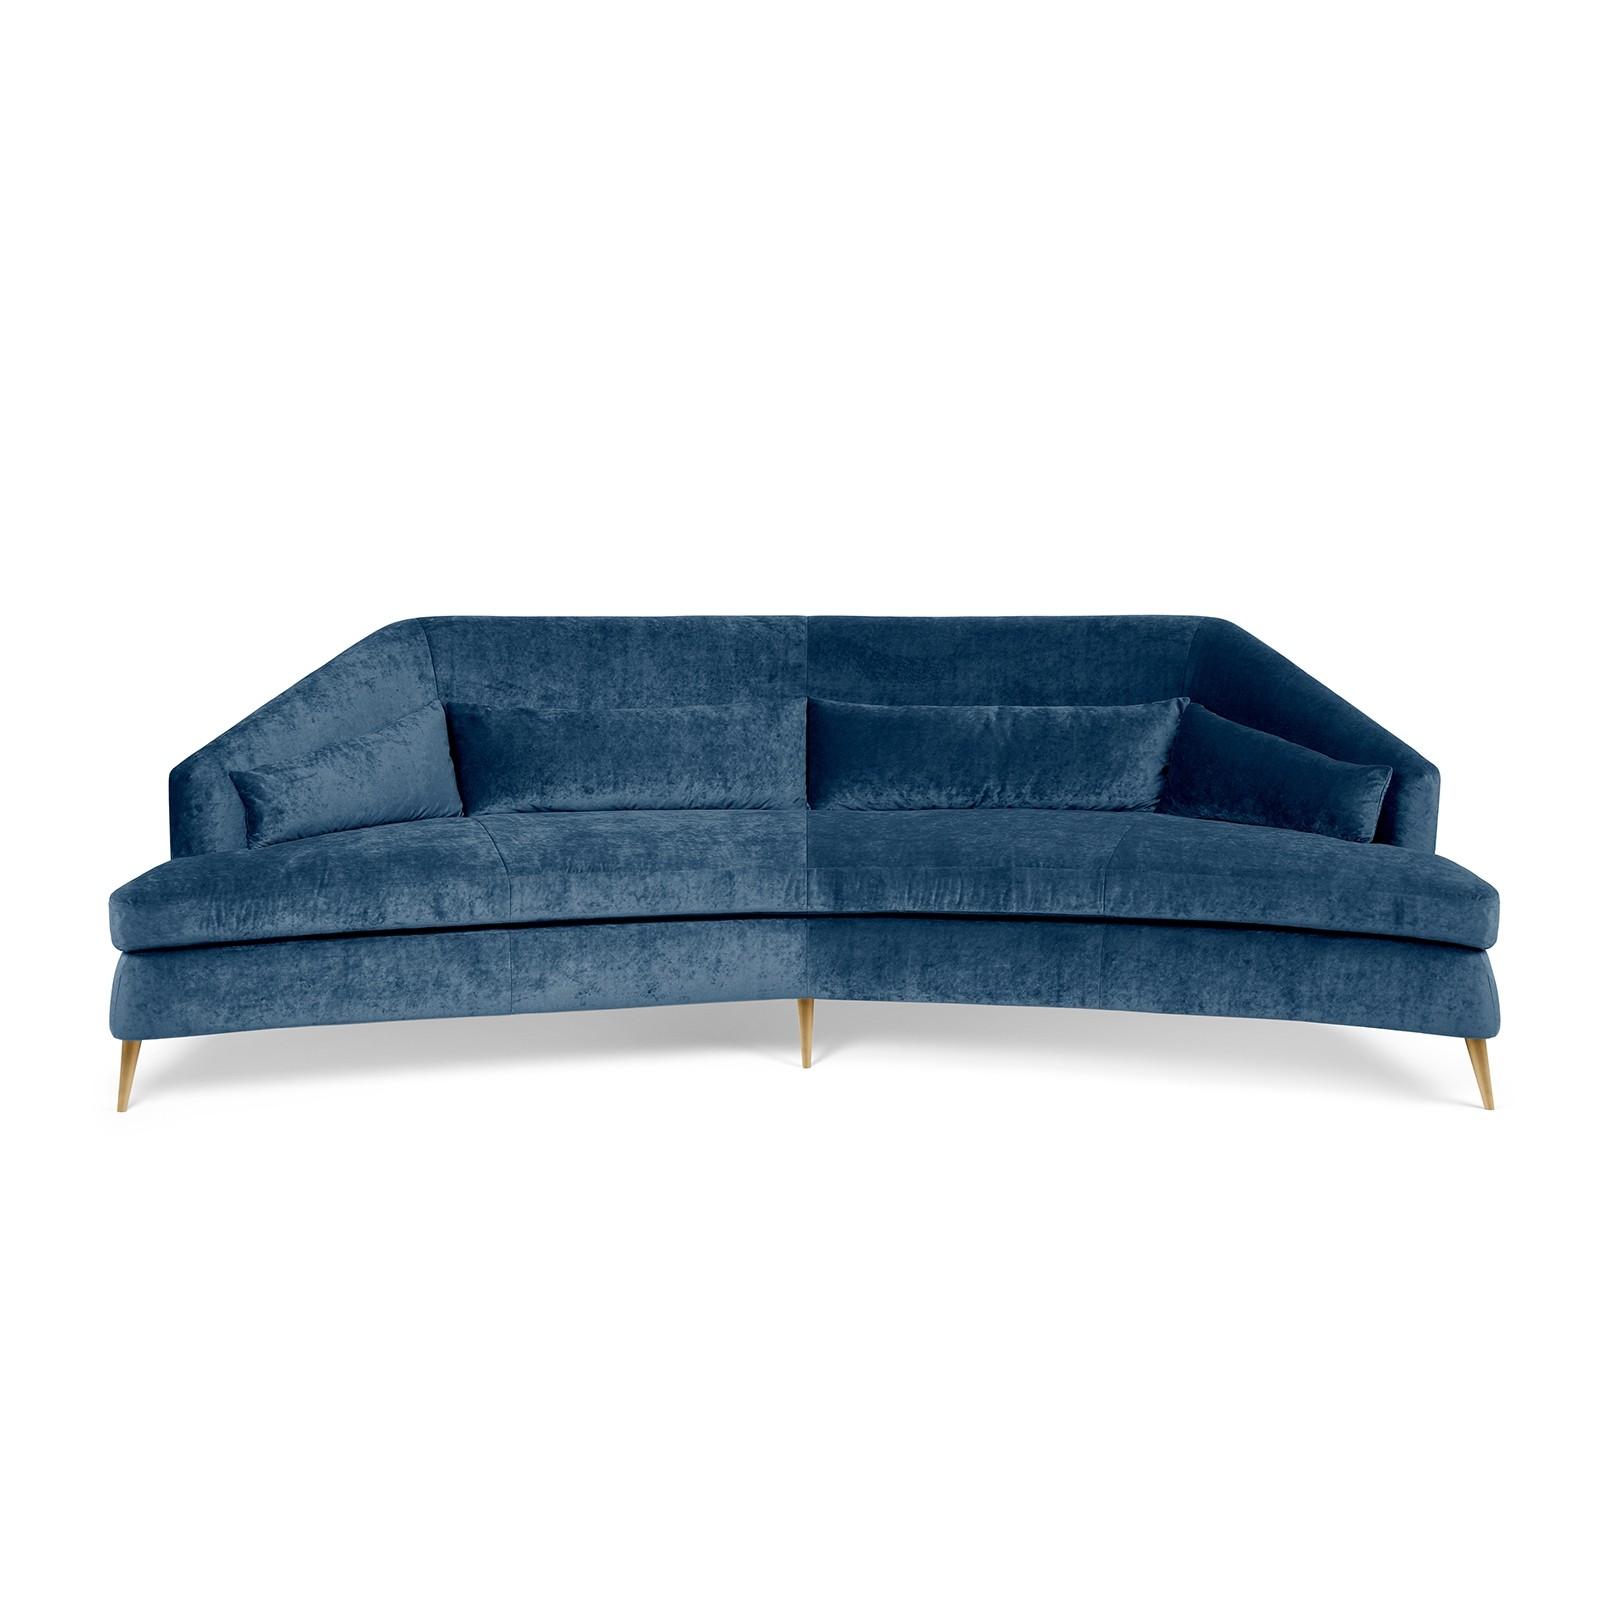 Ex Display Sofa Warehouse >> Munna Margot Sofa | SHOP NOW